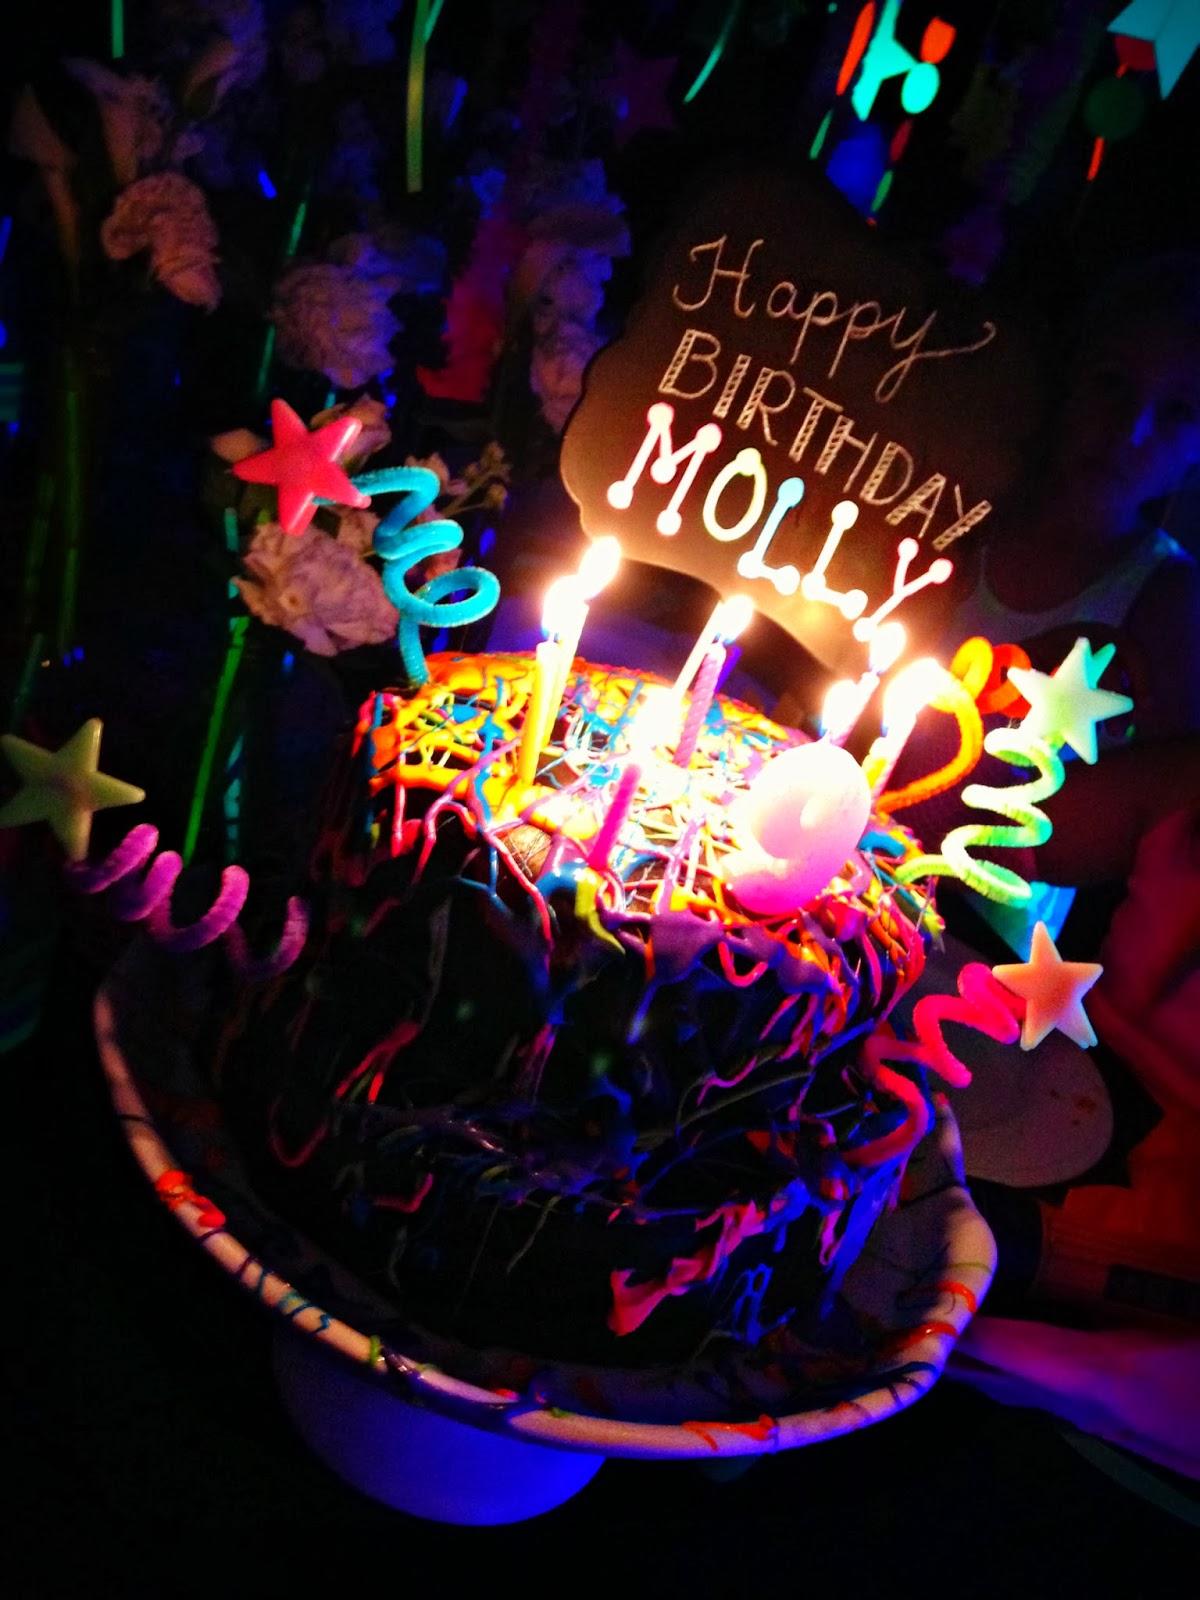 Neon Glow in the Dark Cake